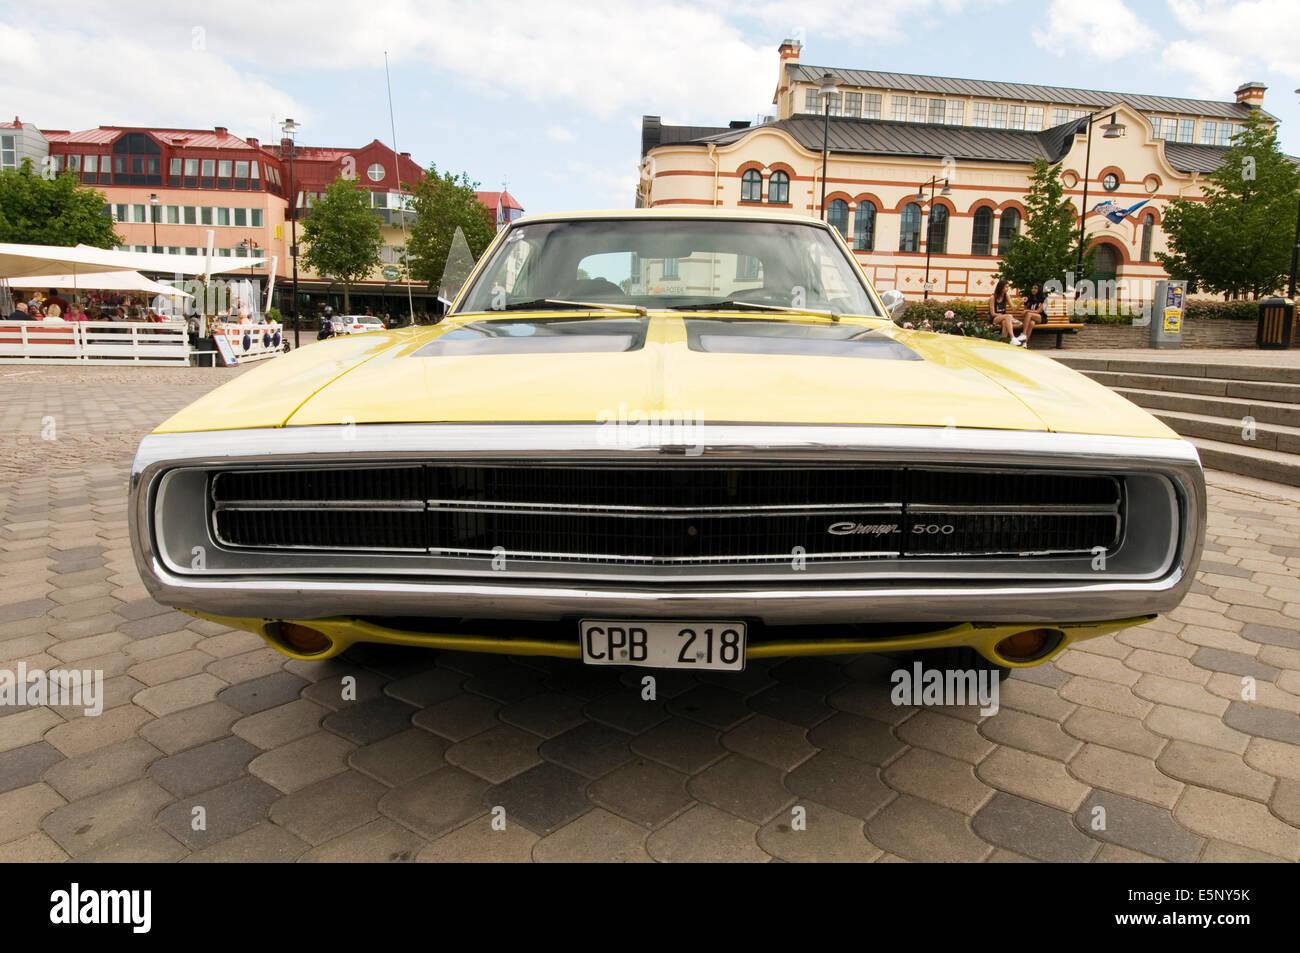 dodge charger 1970 muscle-car oldtimer amerikanische riesig großen